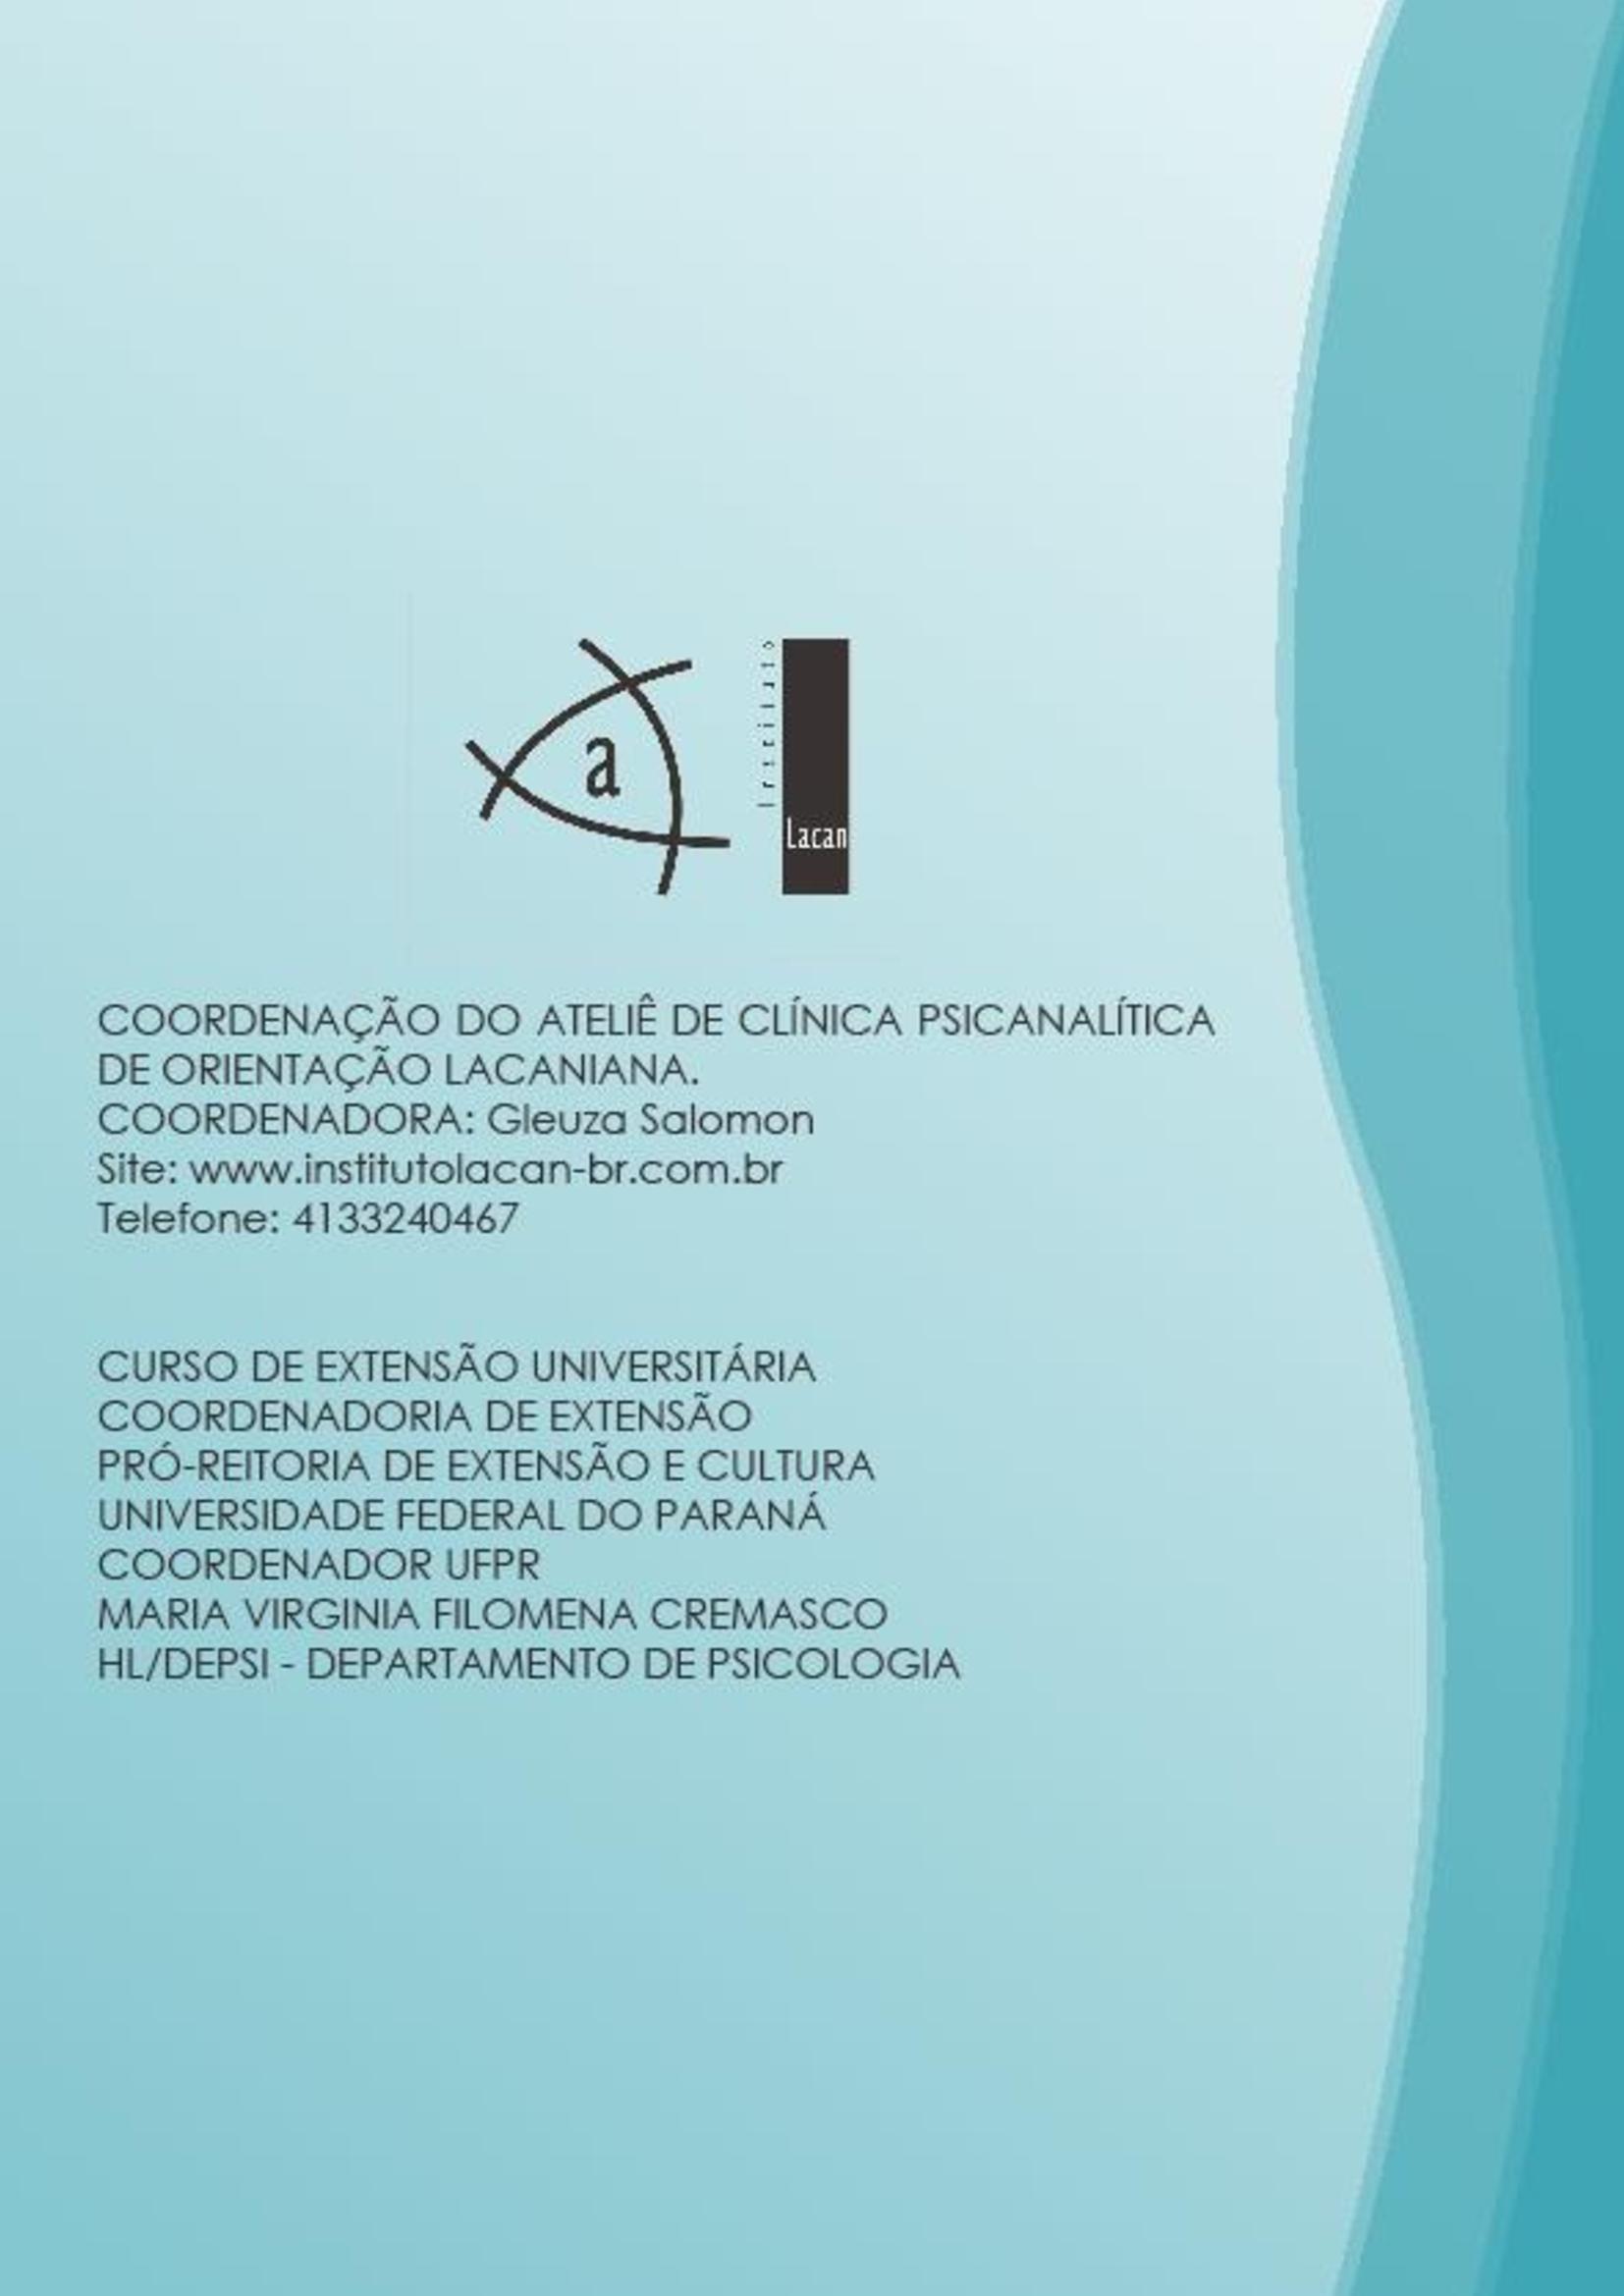 0623c9fce5cc4d0ce622a33998cf978b-16